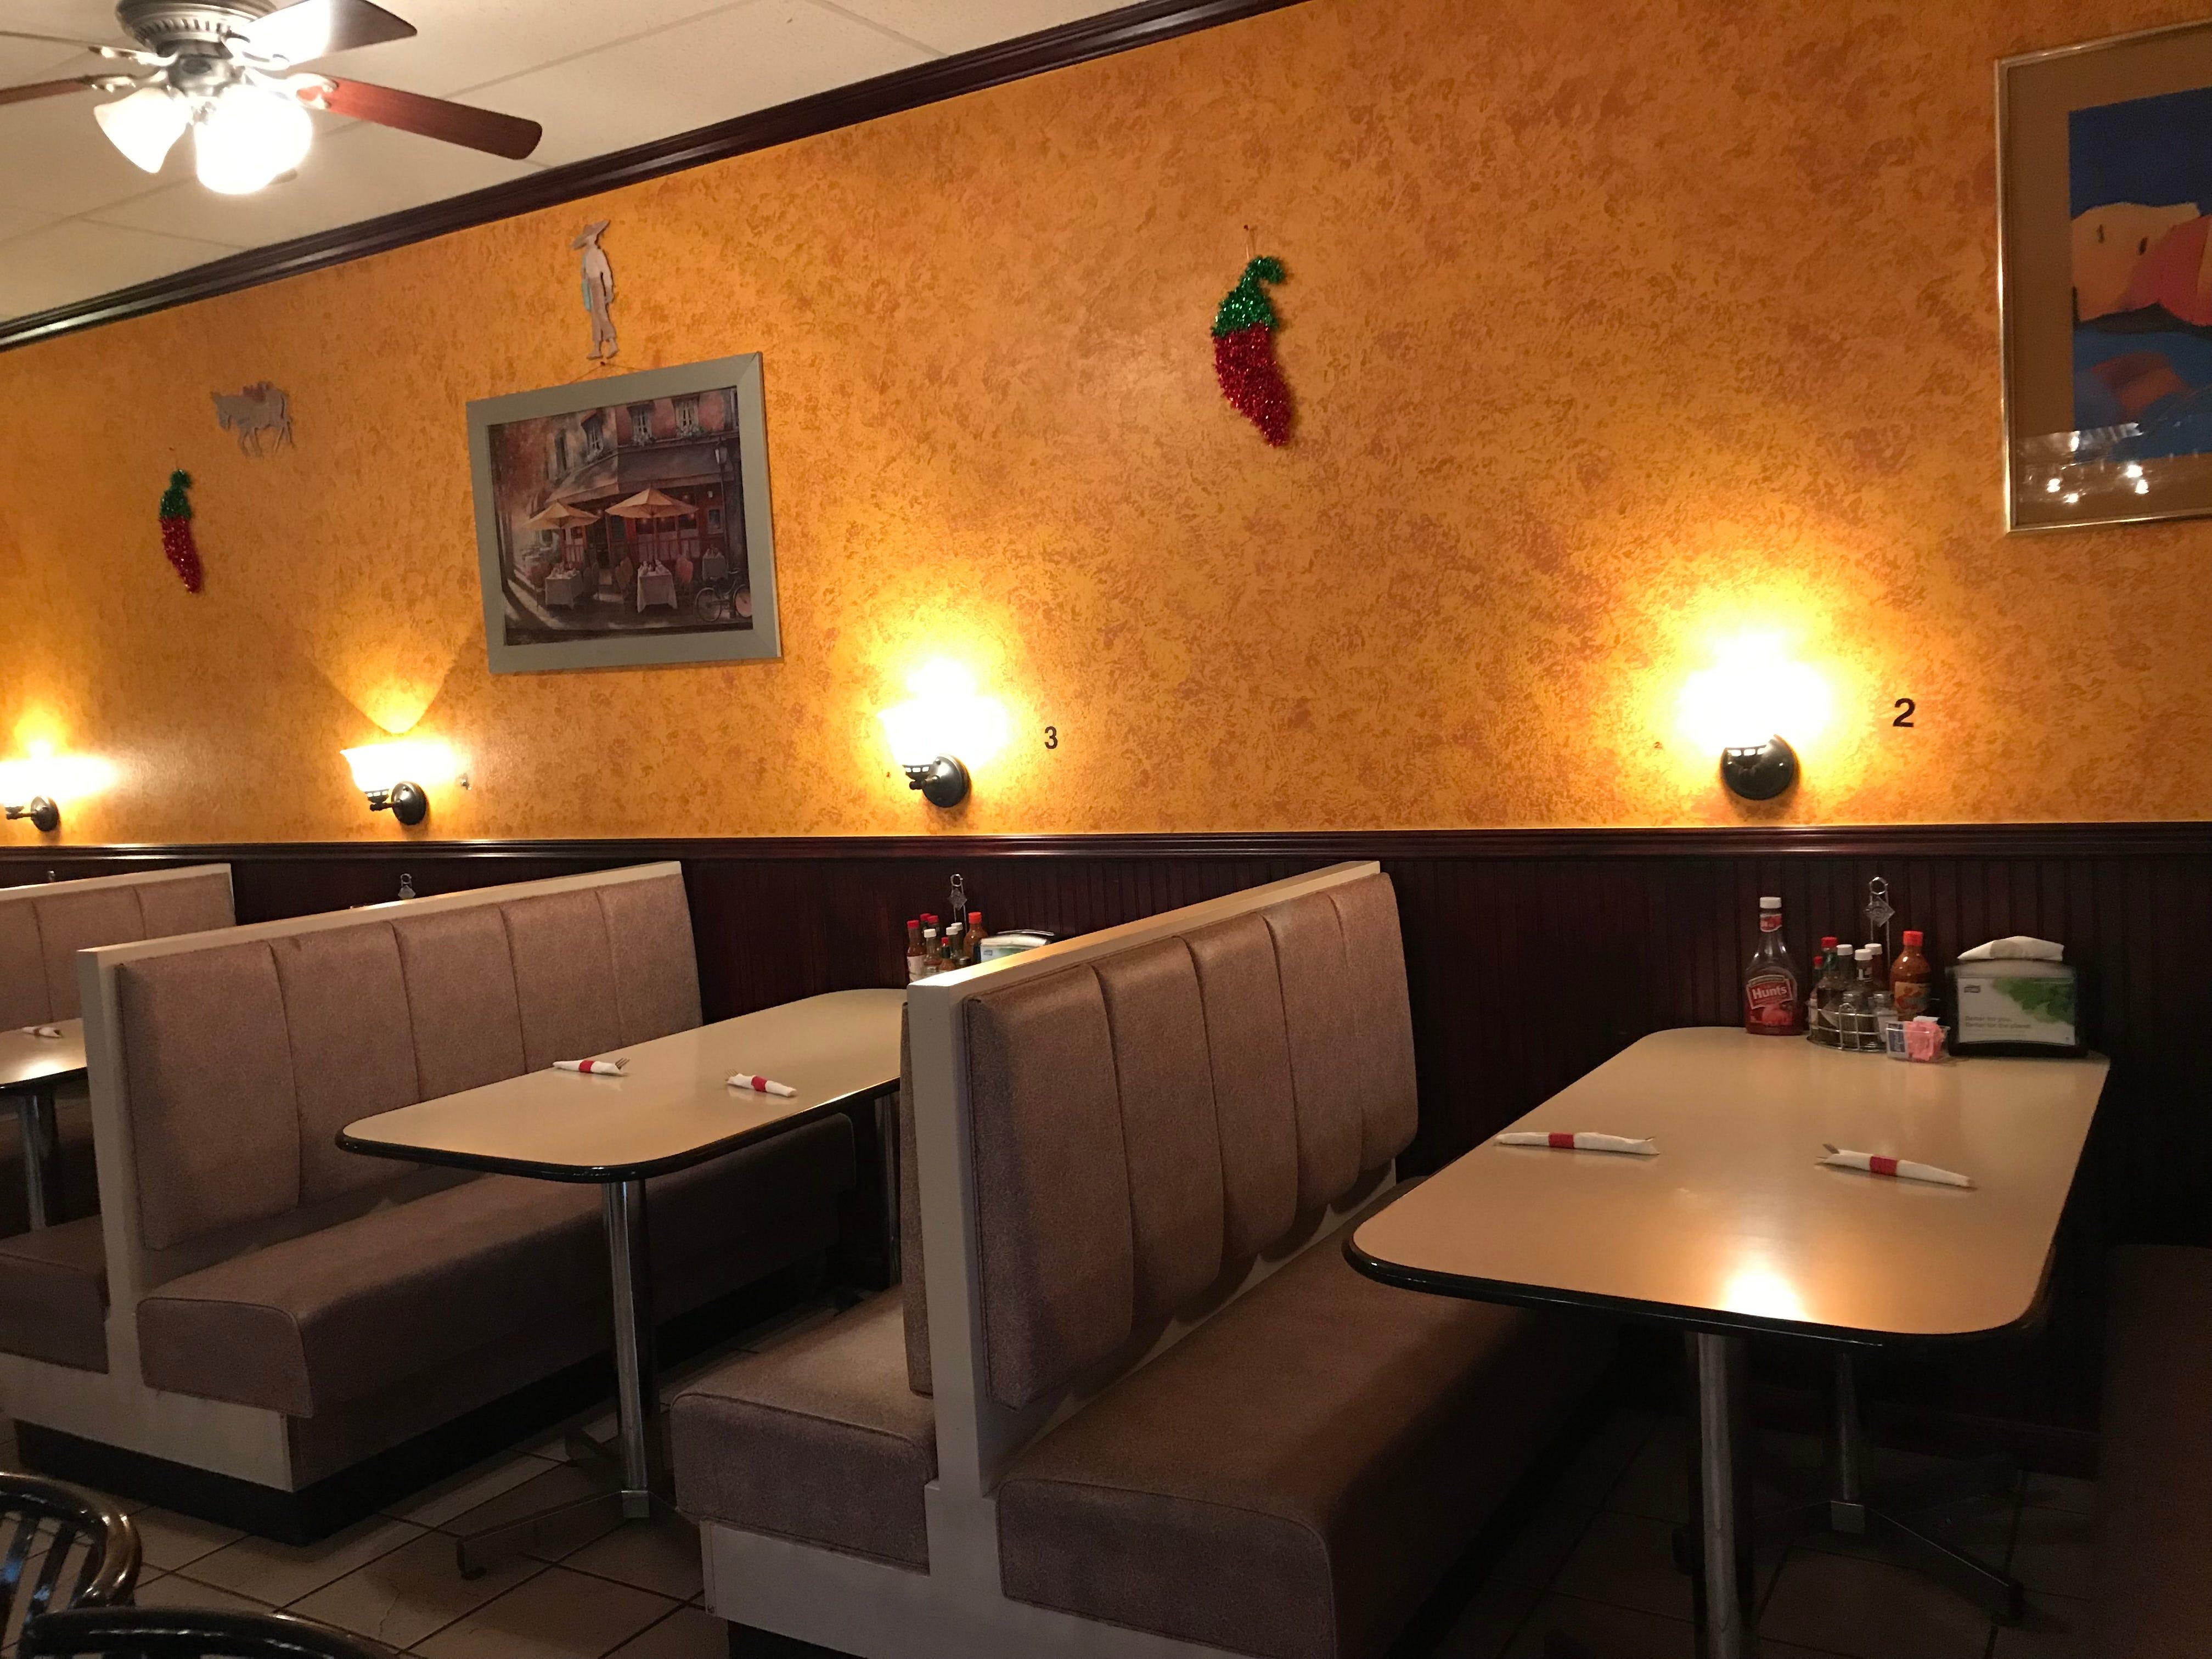 Grandma's Mexican Restaurant is located on 11 Washington Avenue in Endicott.